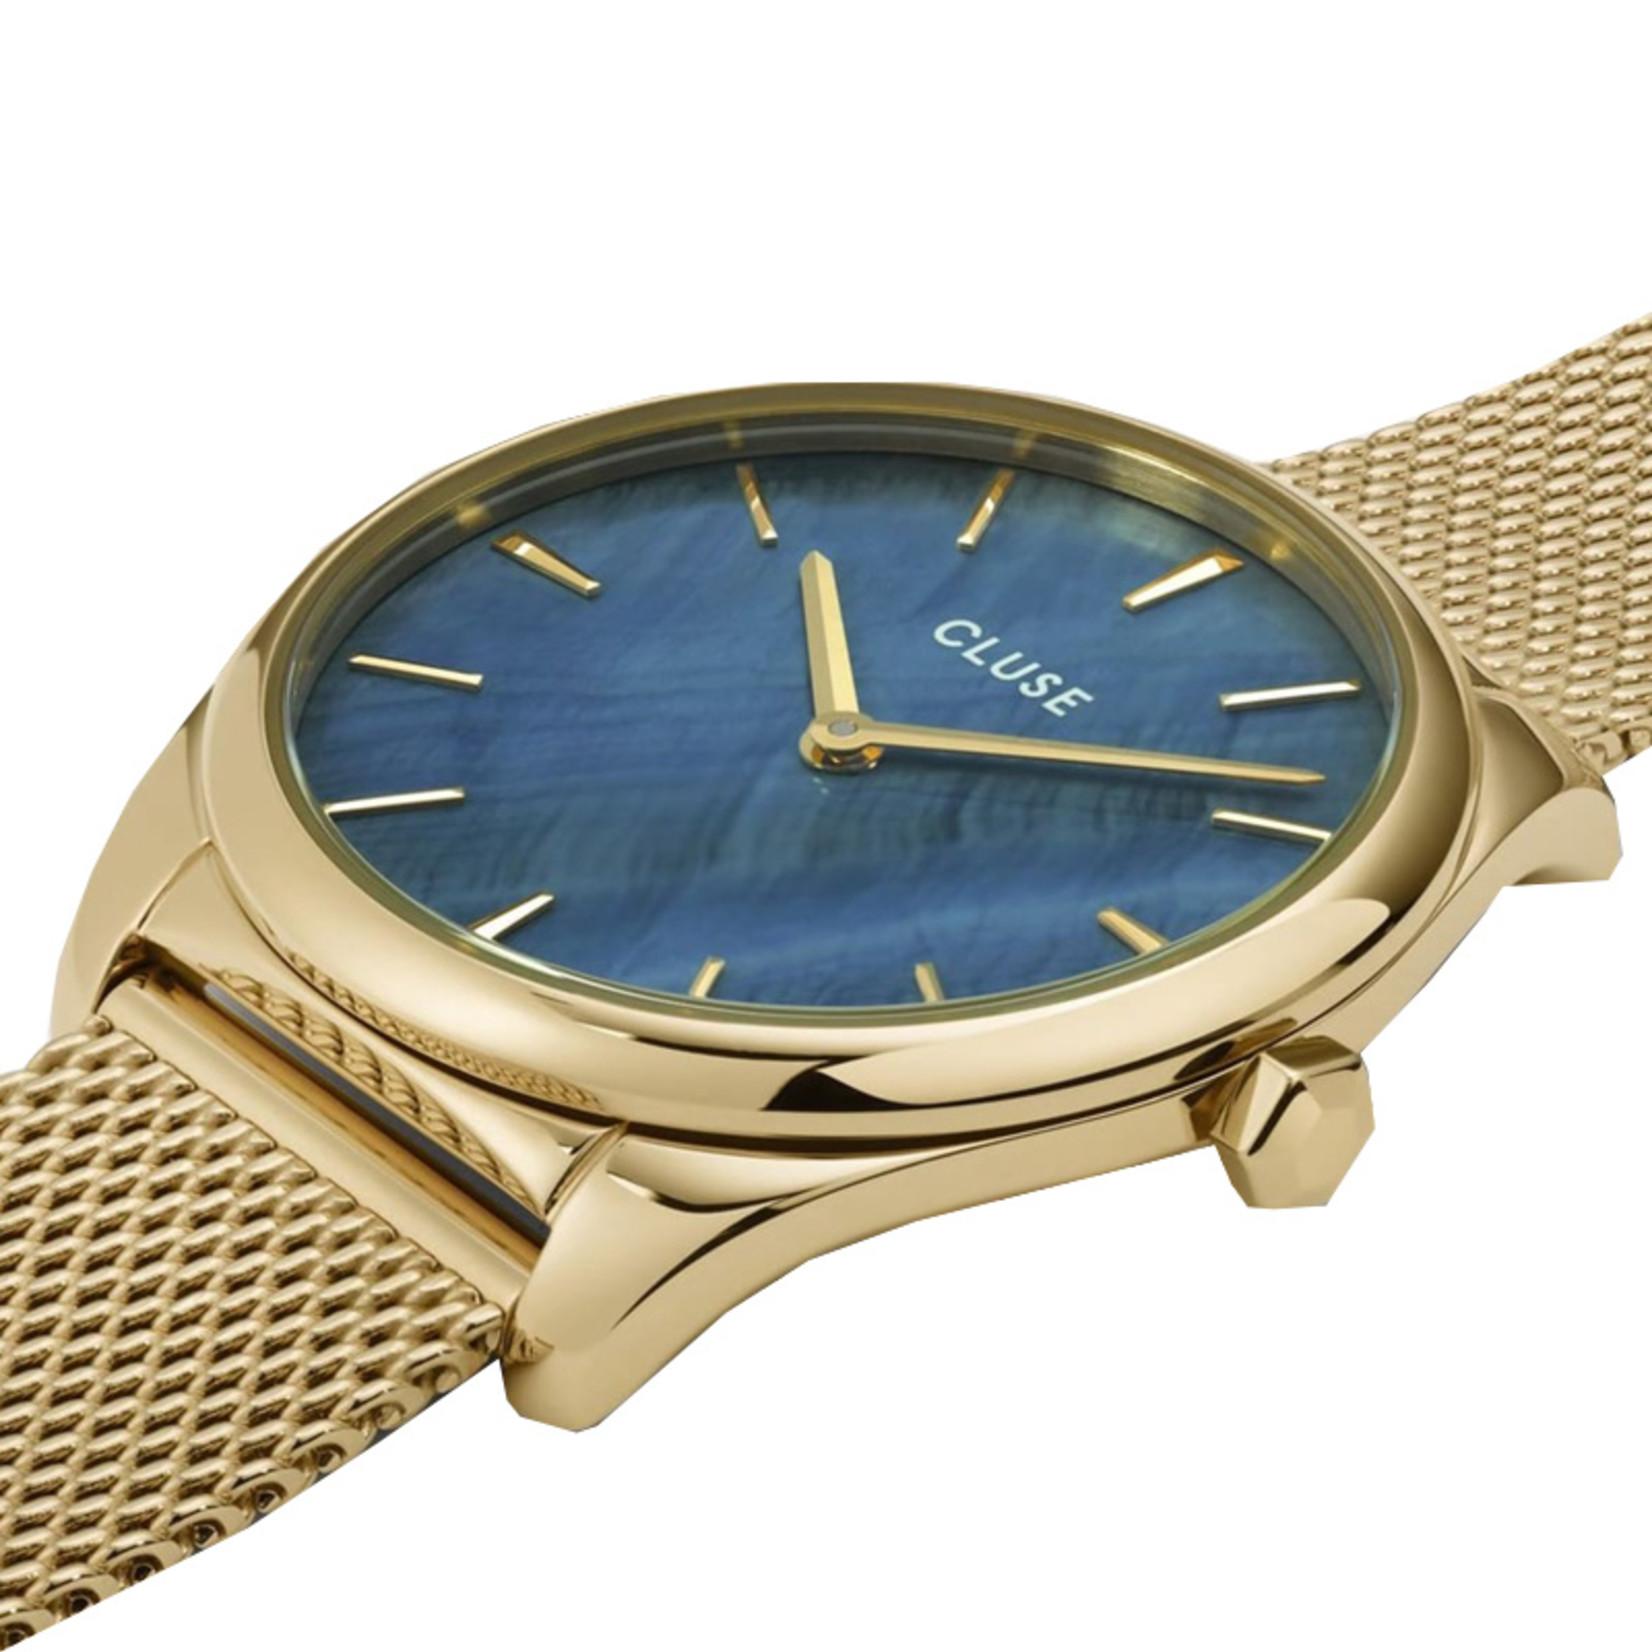 Cluse Cluse Uhr Féroce Petite by Iris Mittenaere I Edelstahl I gold-blau